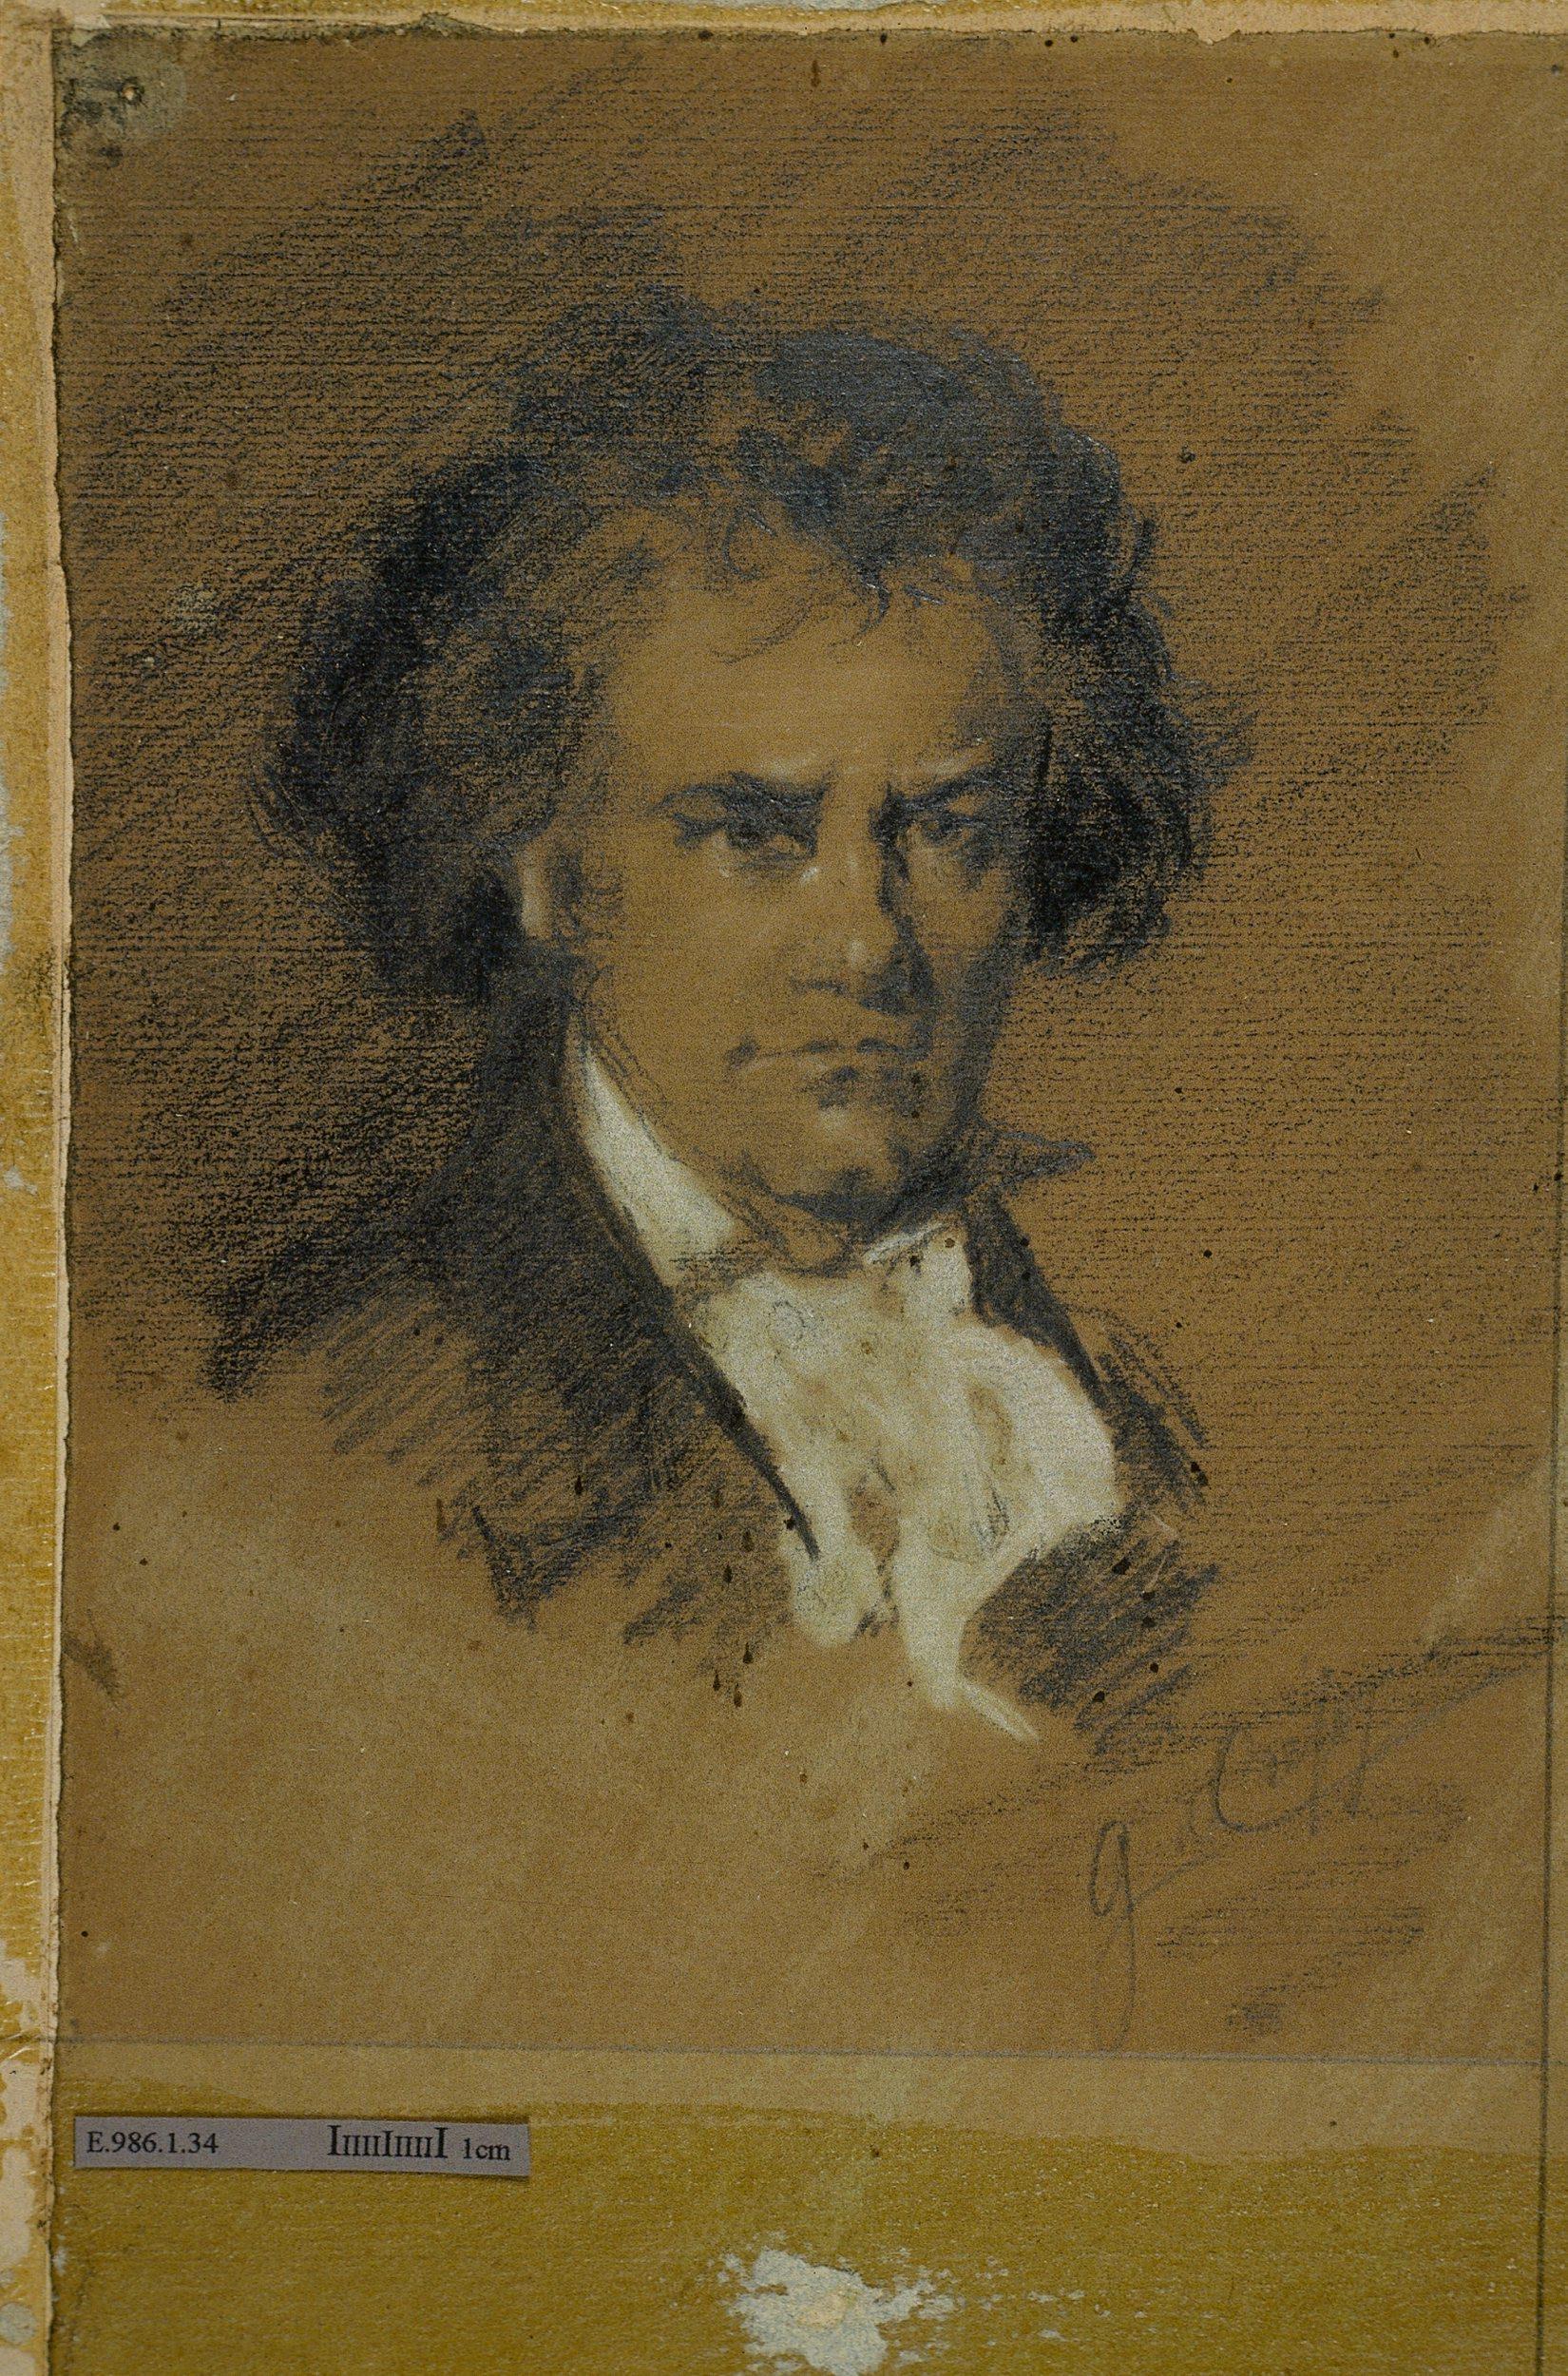 Portrait de Ludwig van Beethoven (1770-1827)   Anonyme